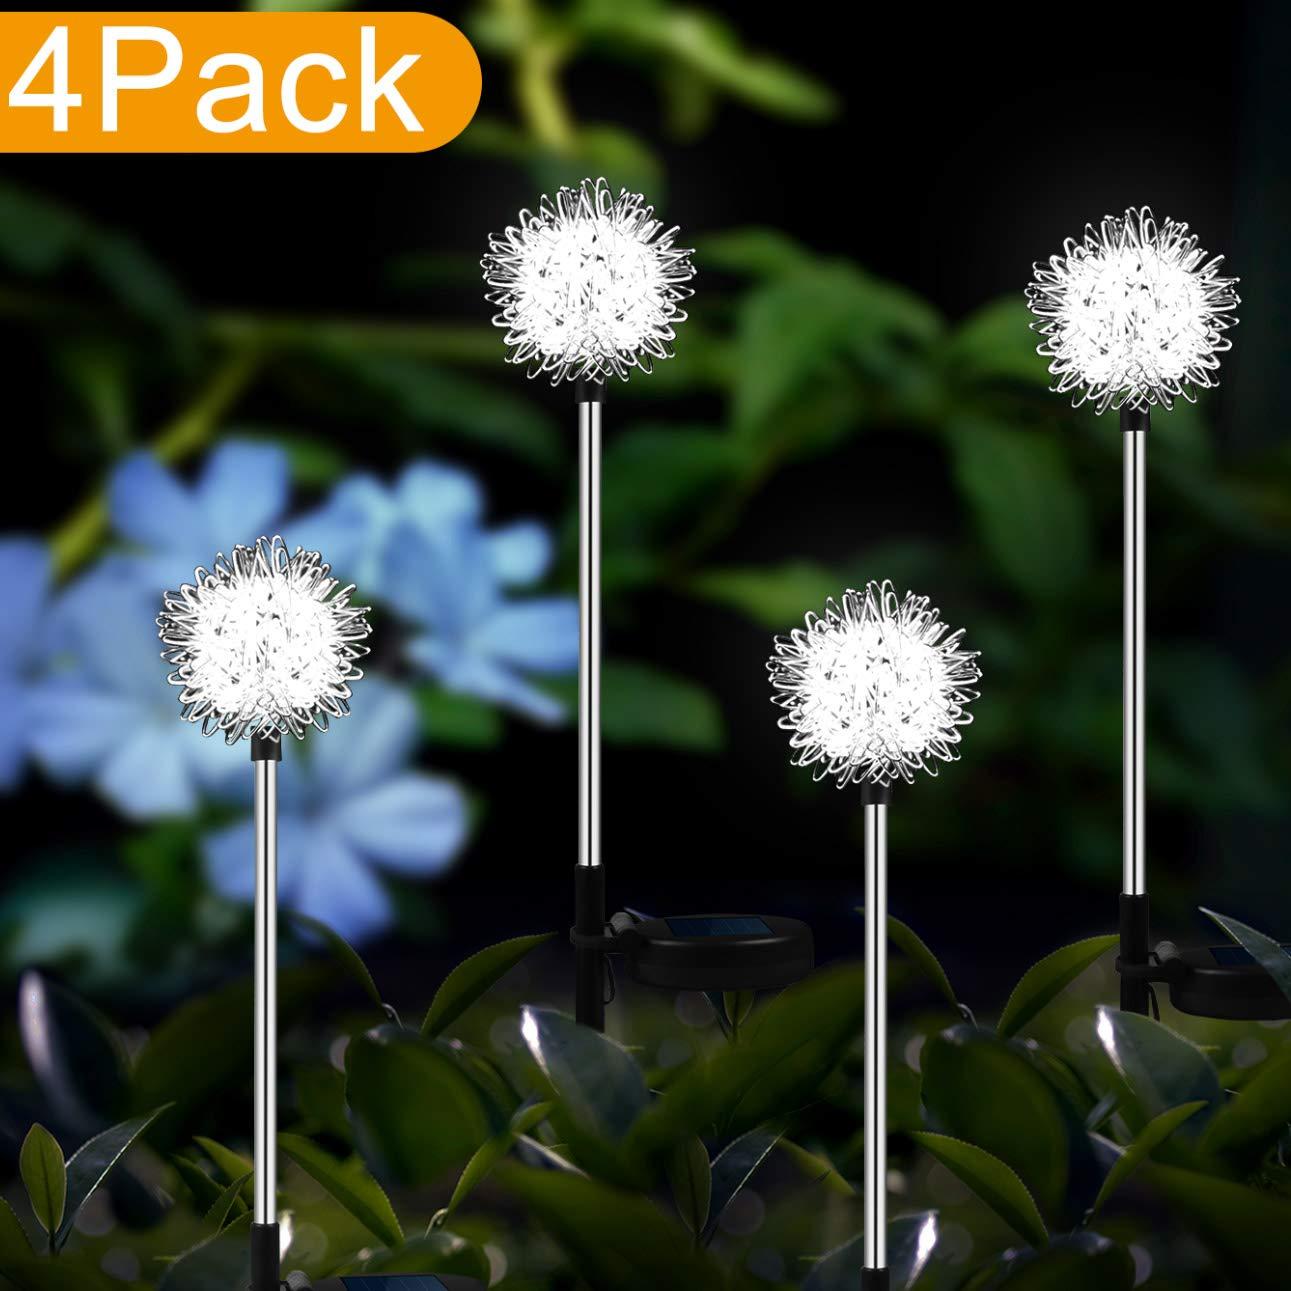 YIYAYIYAYO 4 Pack Solar Garden Lights Outdoor, LED Stake Landscape Lighiting with Dandelion Flower, Waterproof/Auto On/Off - Decorative Figurine Lights for Garden/Patio/Landscape/Pathway/Backyard